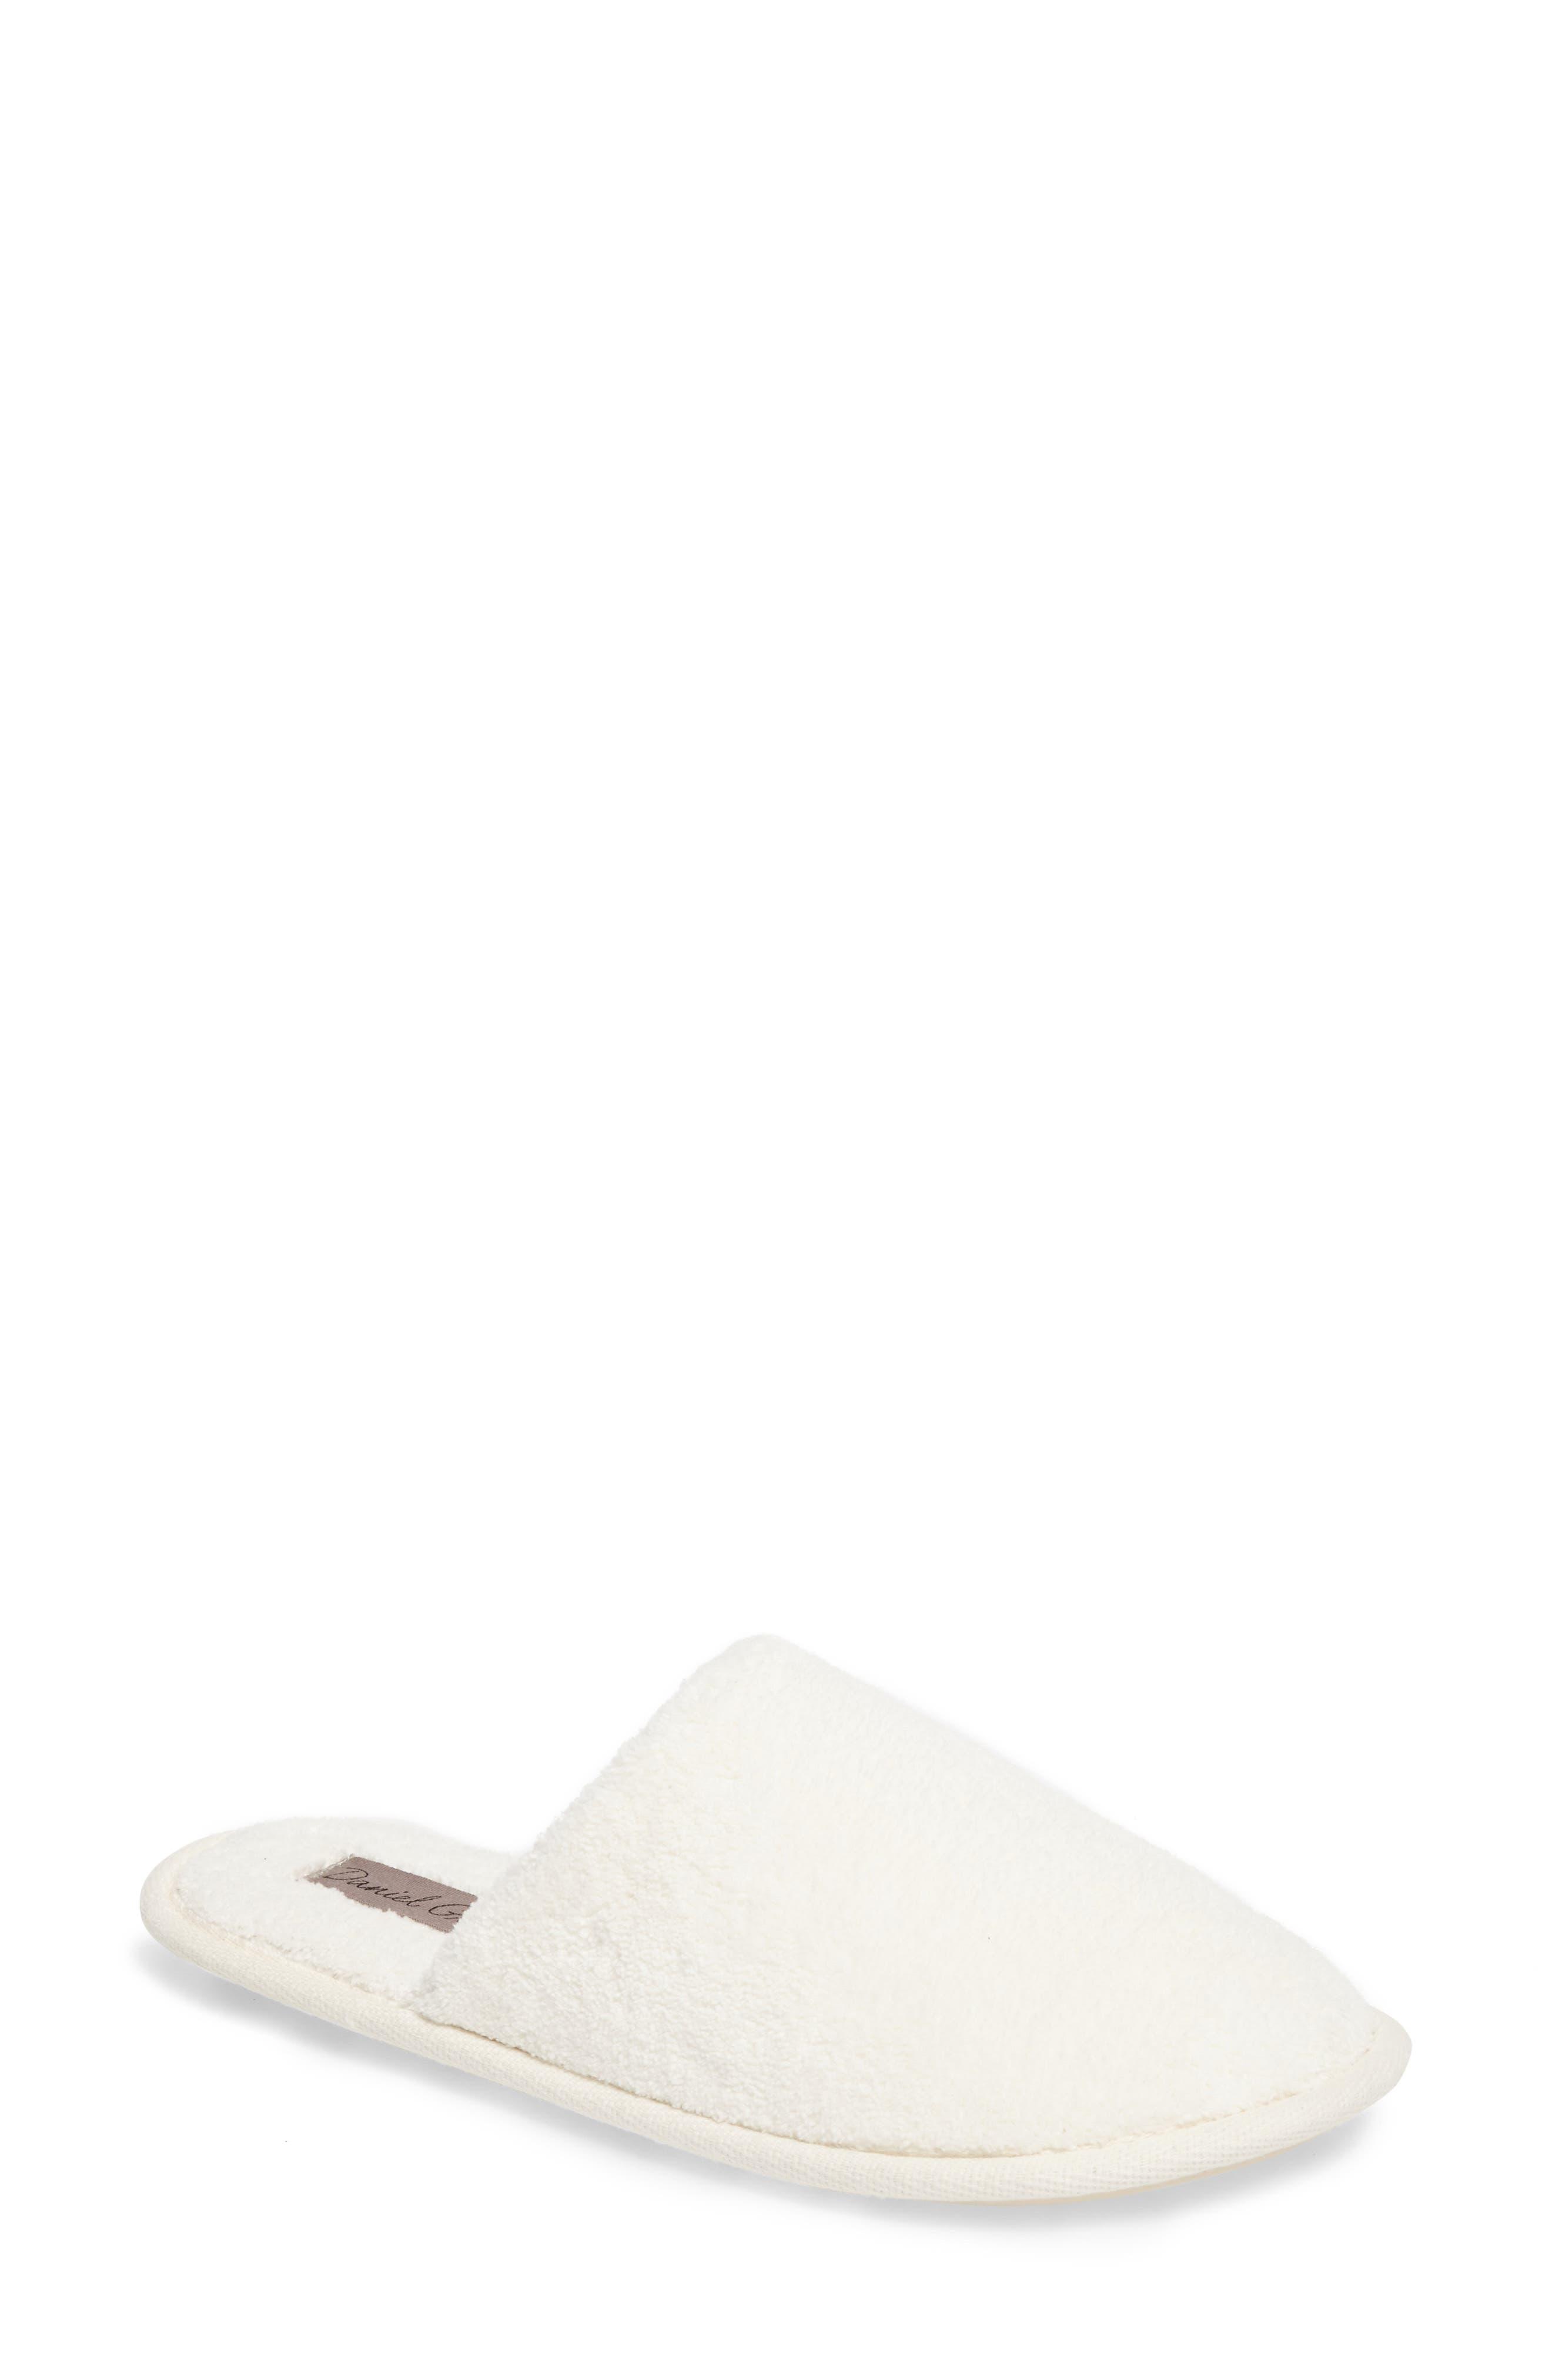 Rave II Slipper,                         Main,                         color, White Fabric